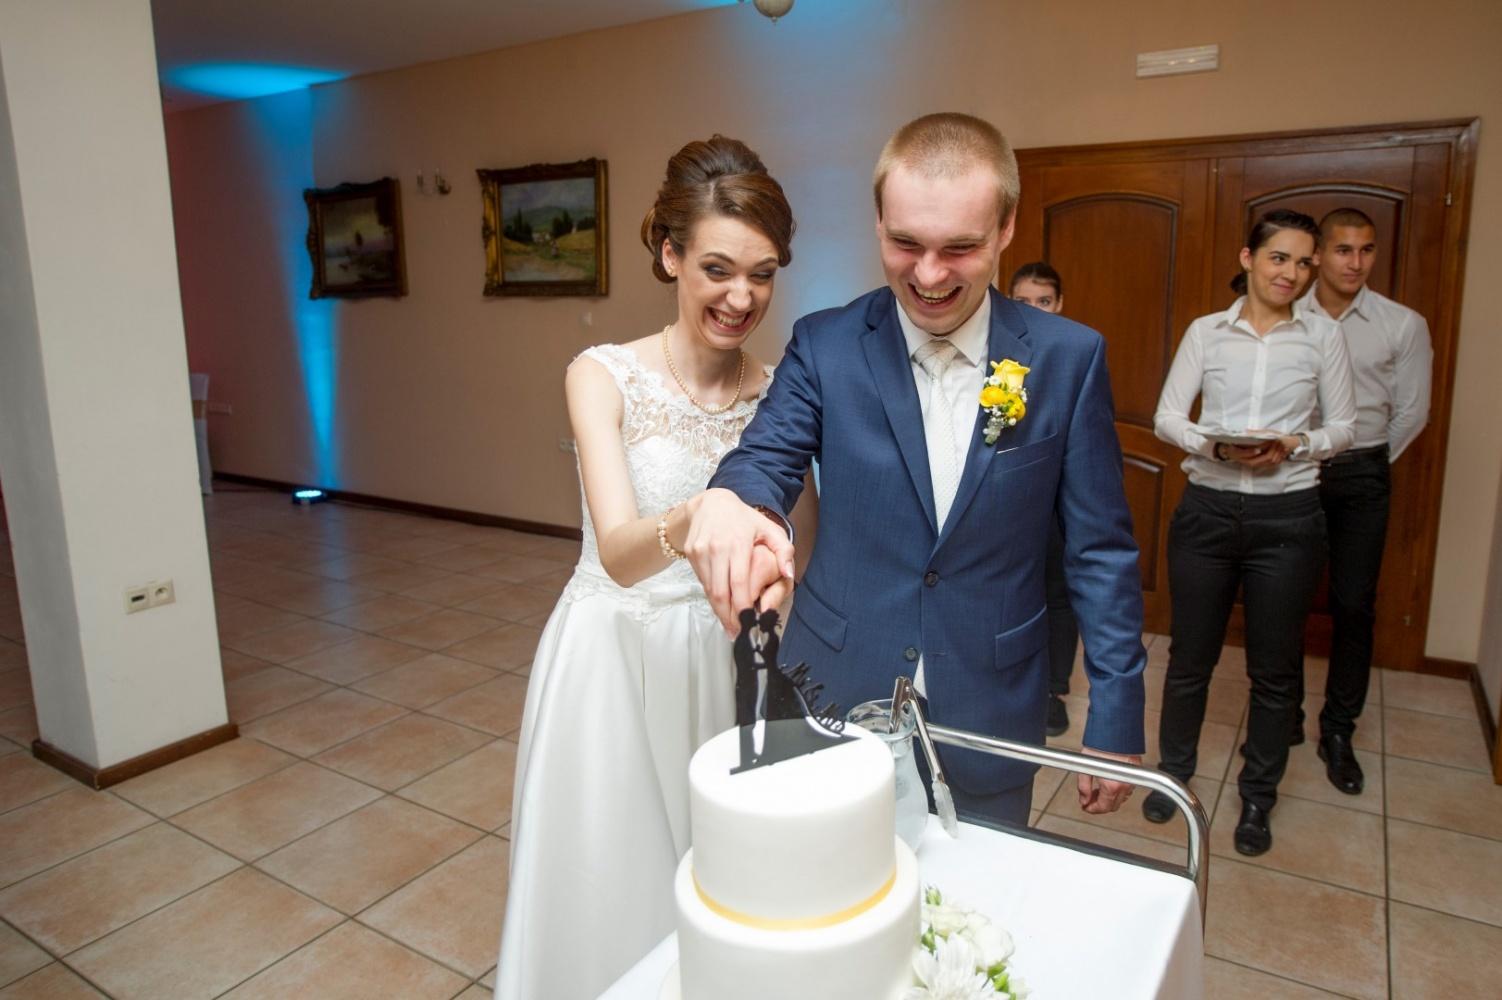 http://www.fotoz.sk/images/gallery-23/normal/svadba-_sv_petrus-vini_131.jpg